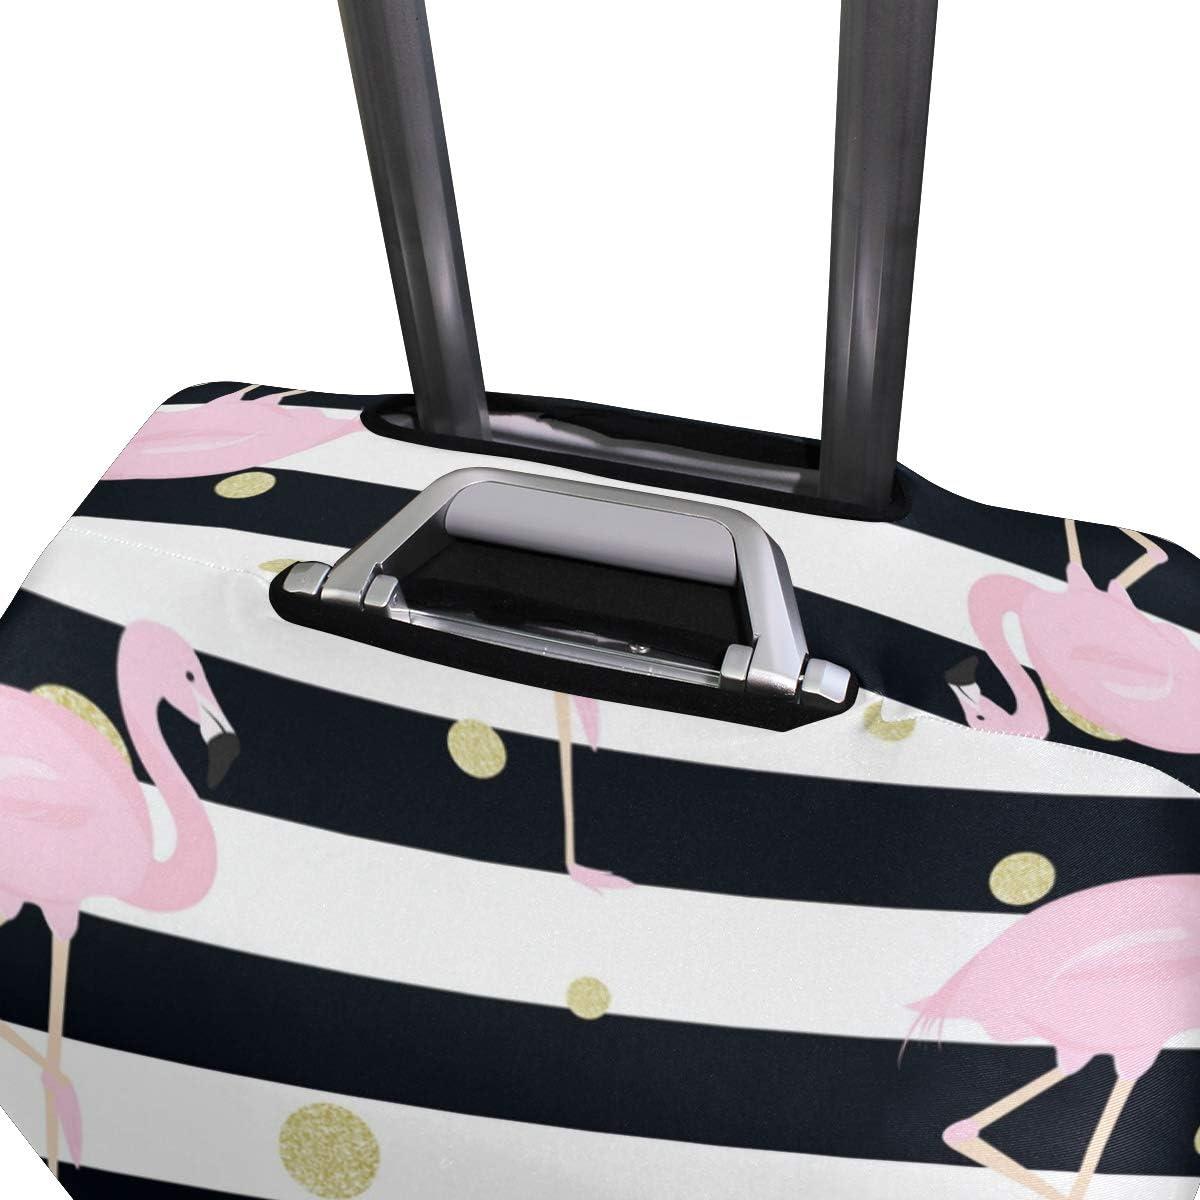 FANTAZIO Flamingos Gold Polka Dot Stripes Suitcase Protective Cover Luggage Cover